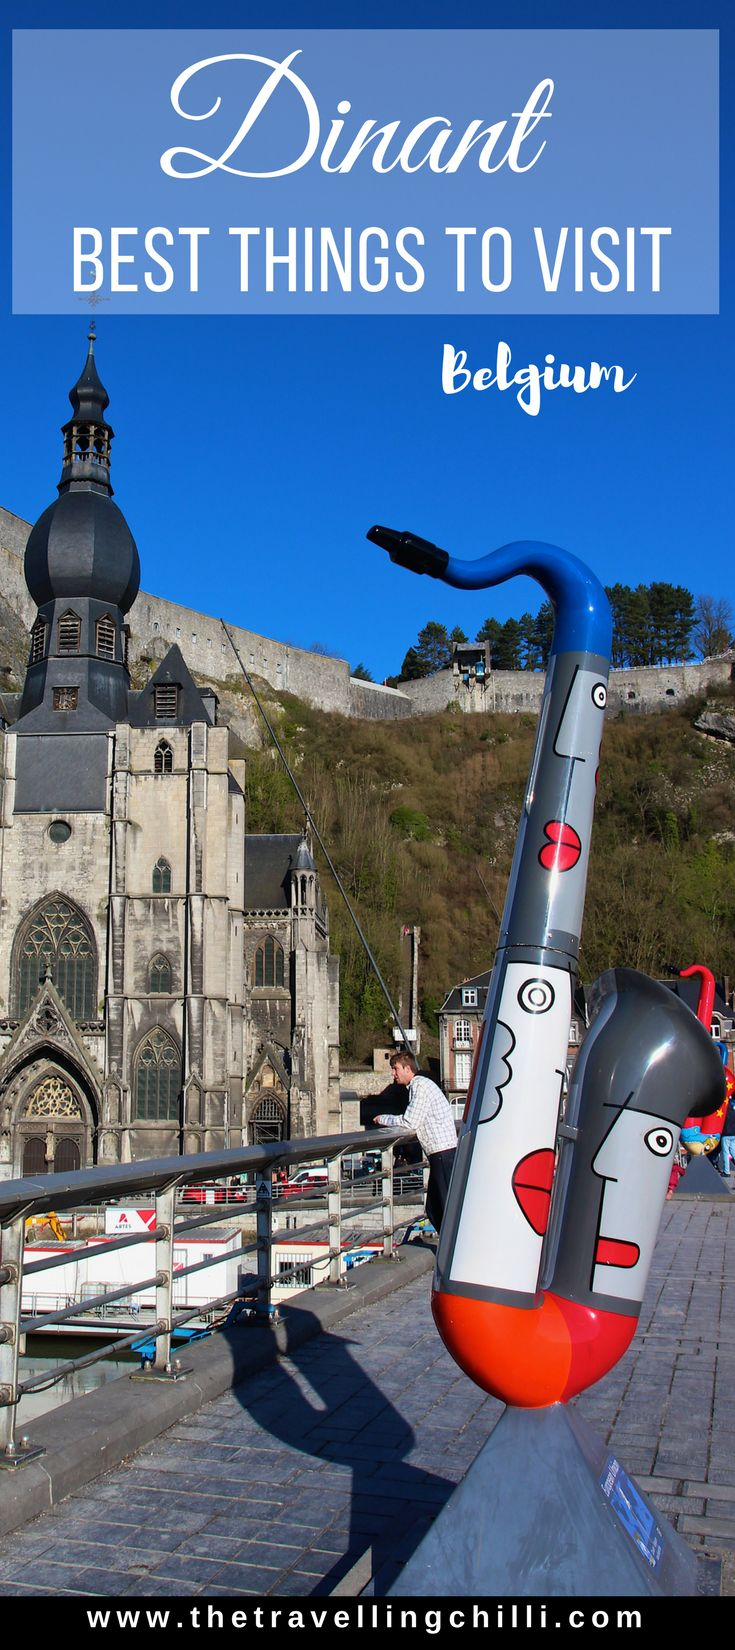 Discover Dinant in Belgium | Best things to visit in Dinant Belgium | Leffe Beer | Saxophones | Adolphe Sax | Cidadel Dinant Belgium